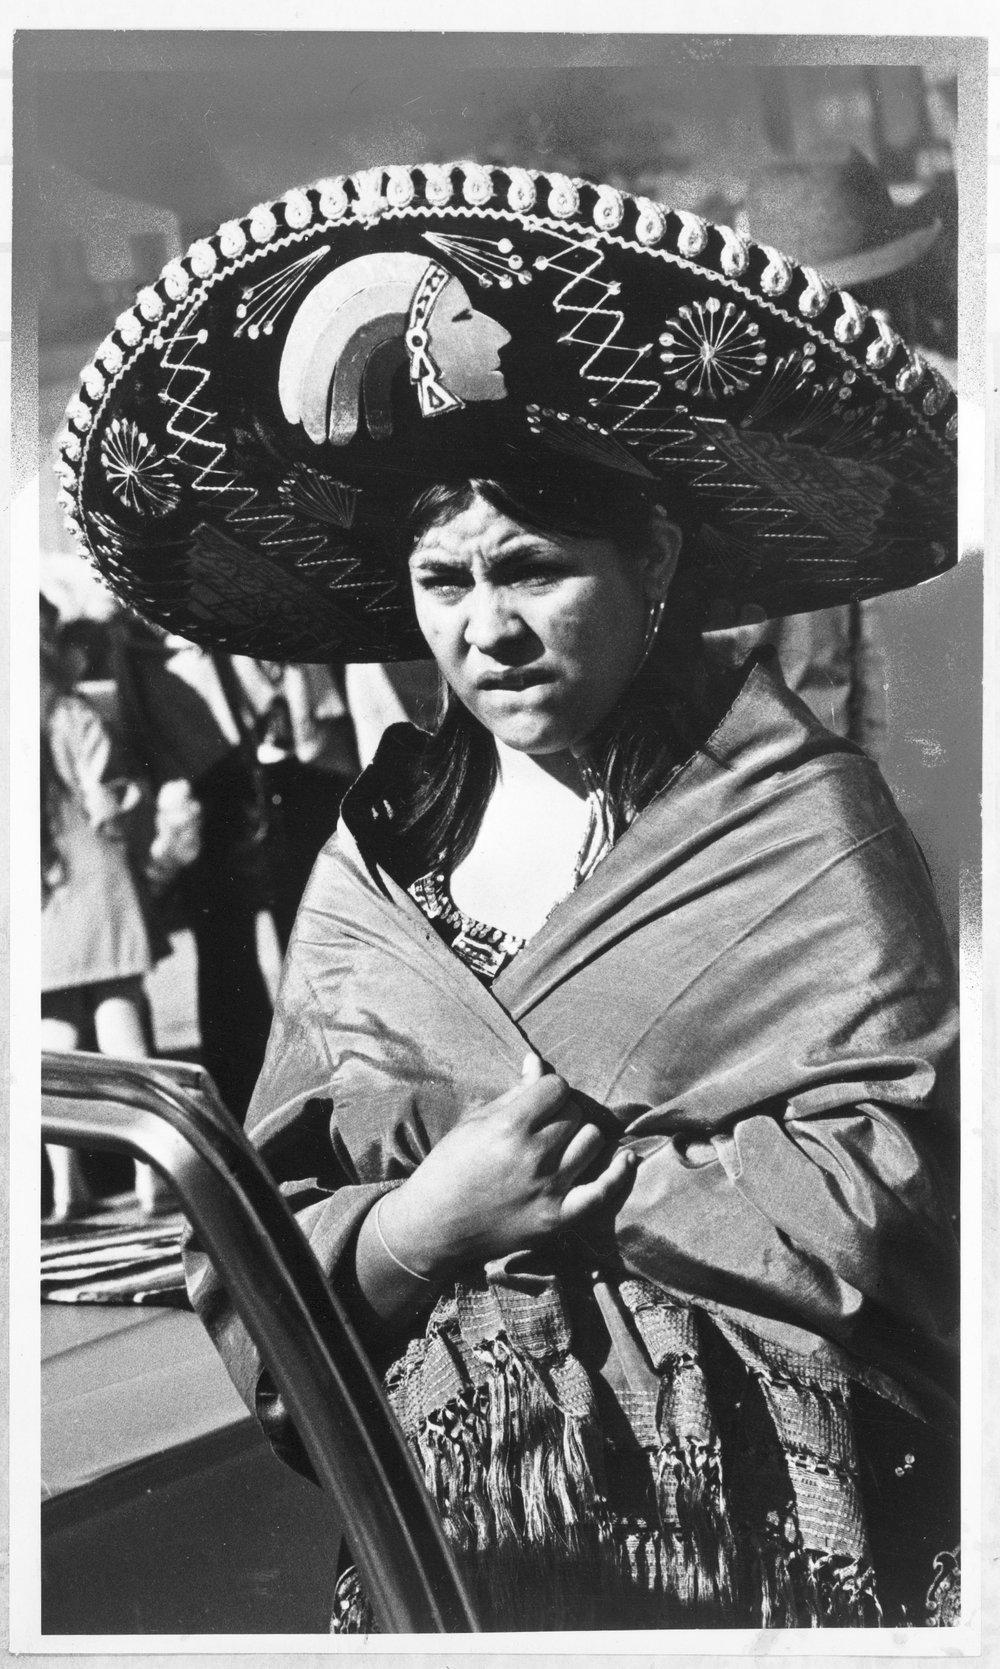 Mexican Independence Day Parade, Topeka, Kansas